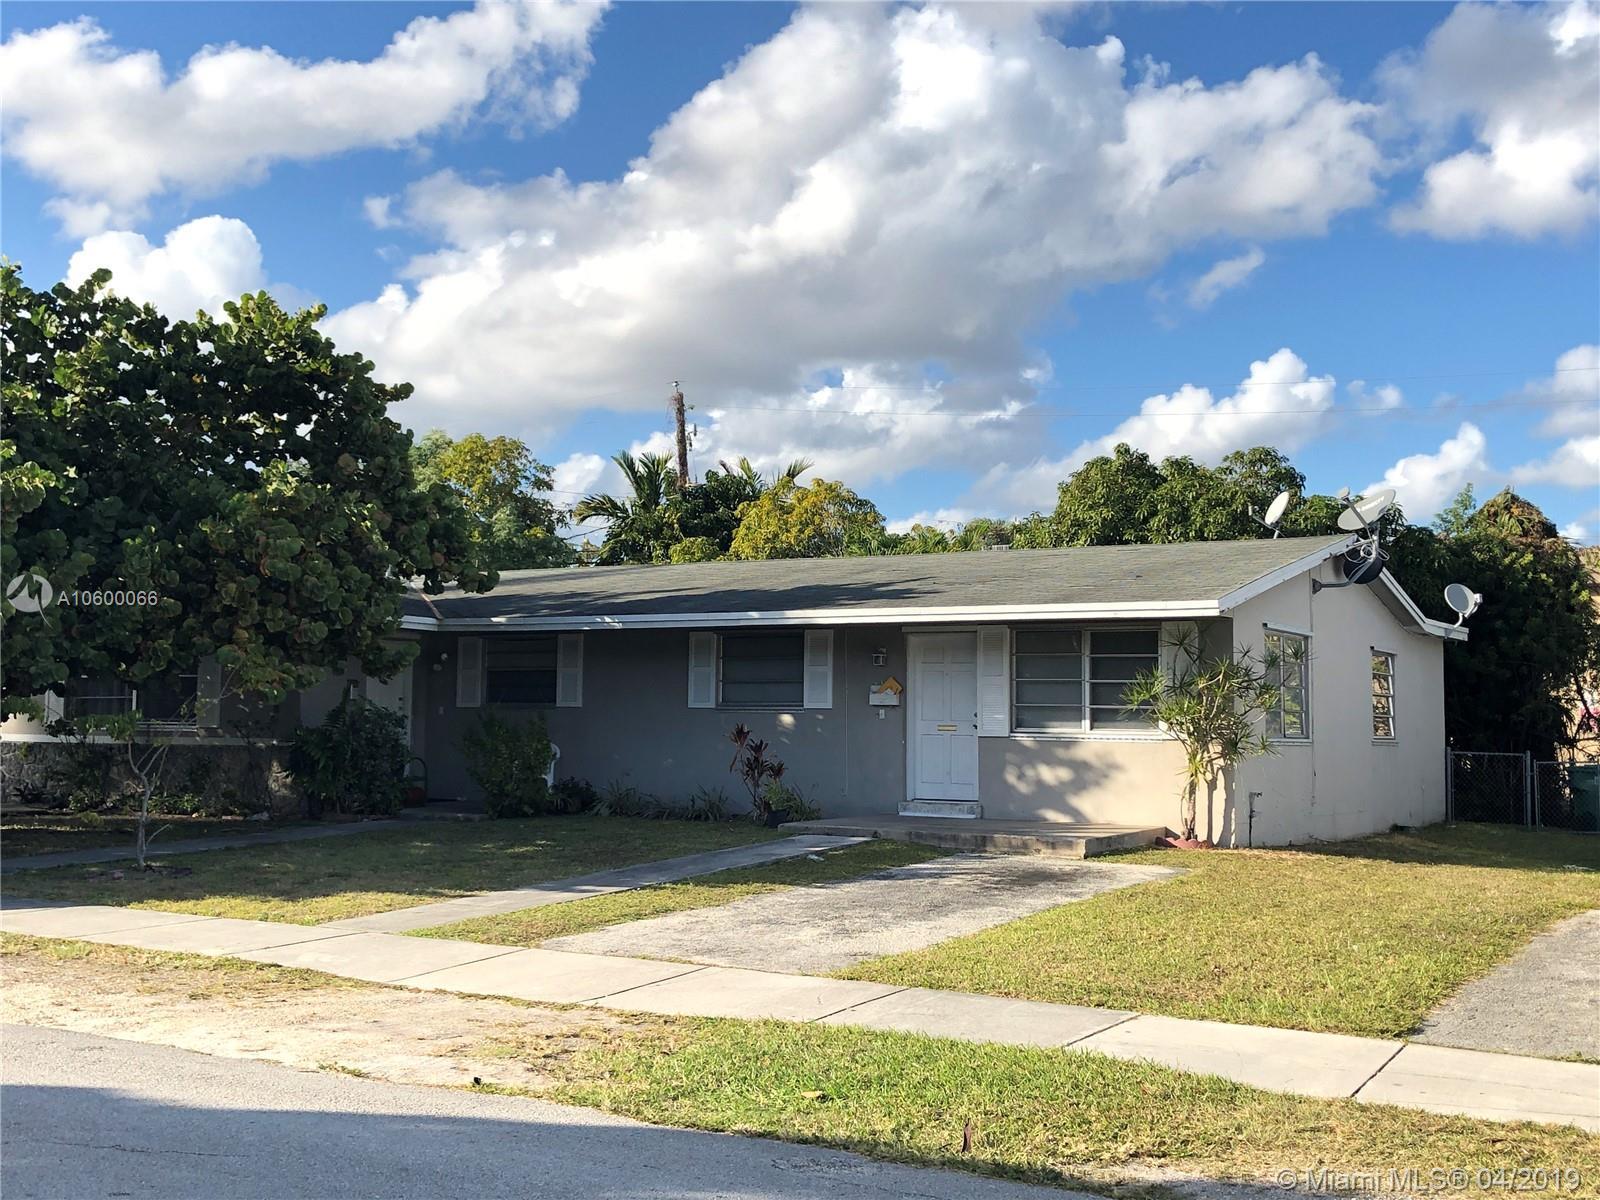 1311 NE 118th St, Miami Shores, Florida